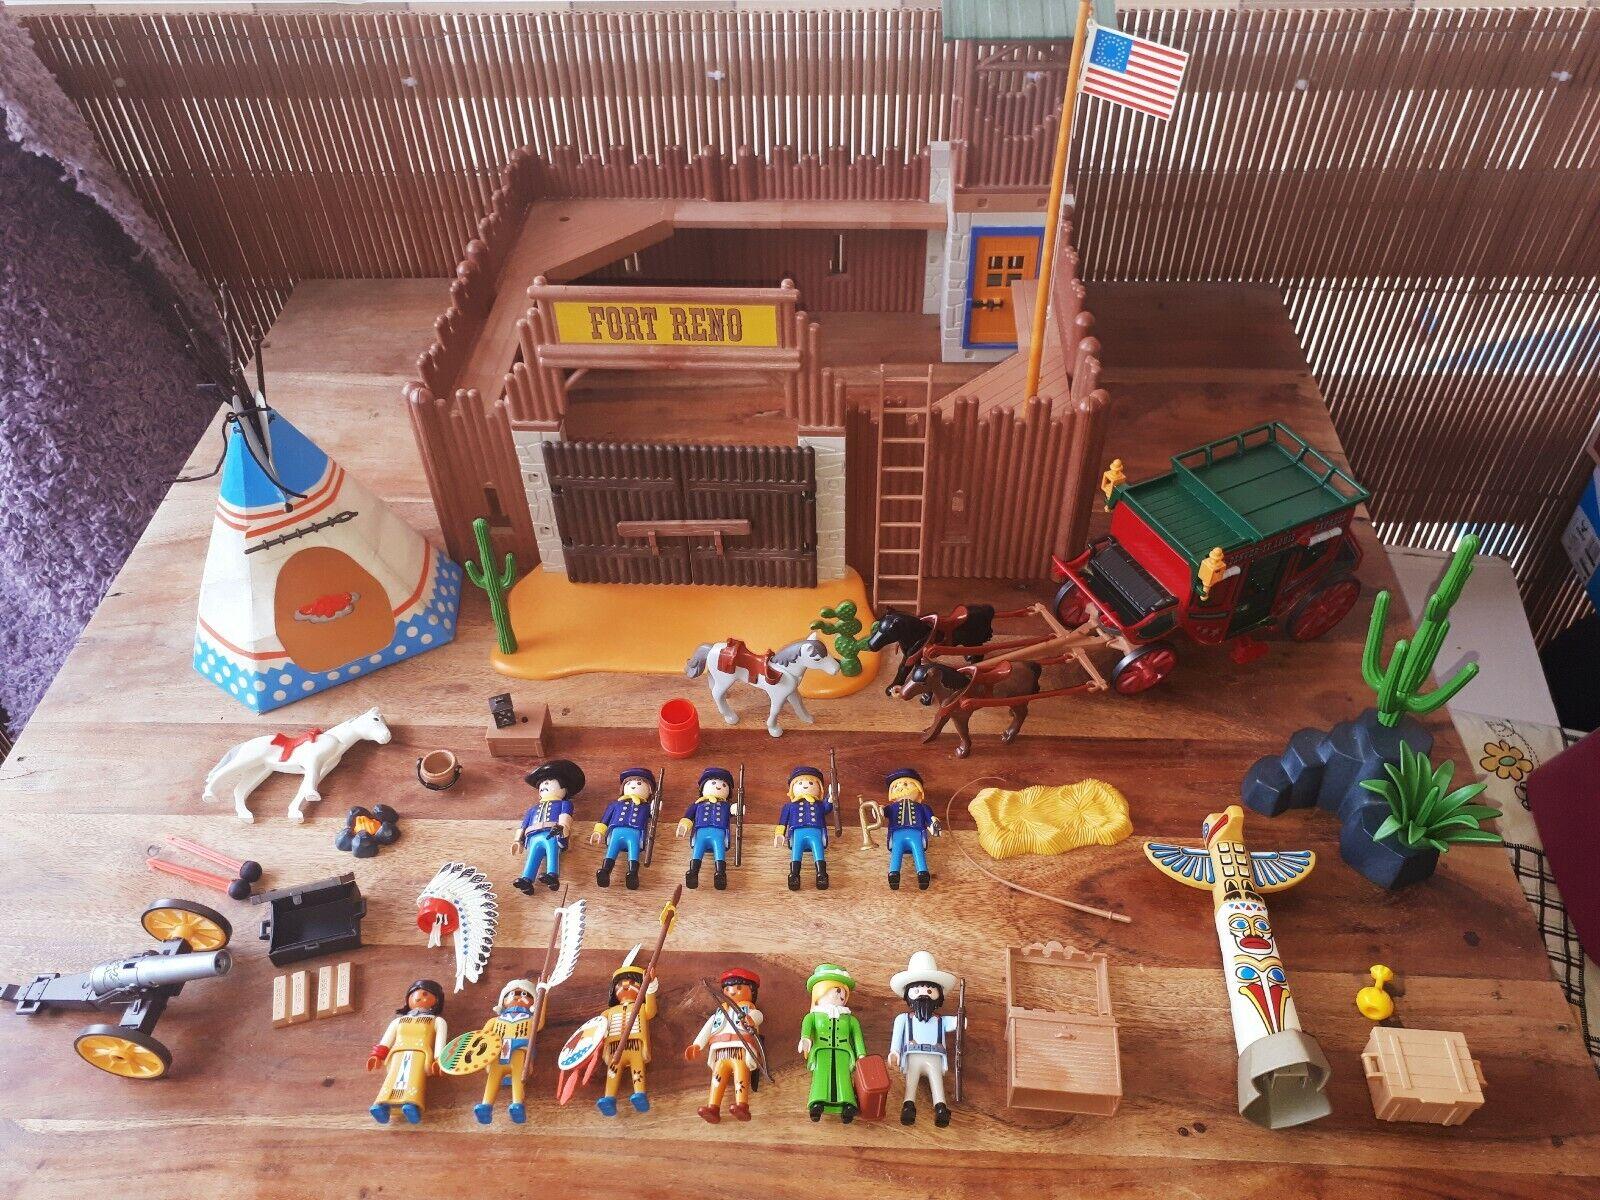 Playmobil Fort Reno 4072 descatalogado fuerte far west Randall